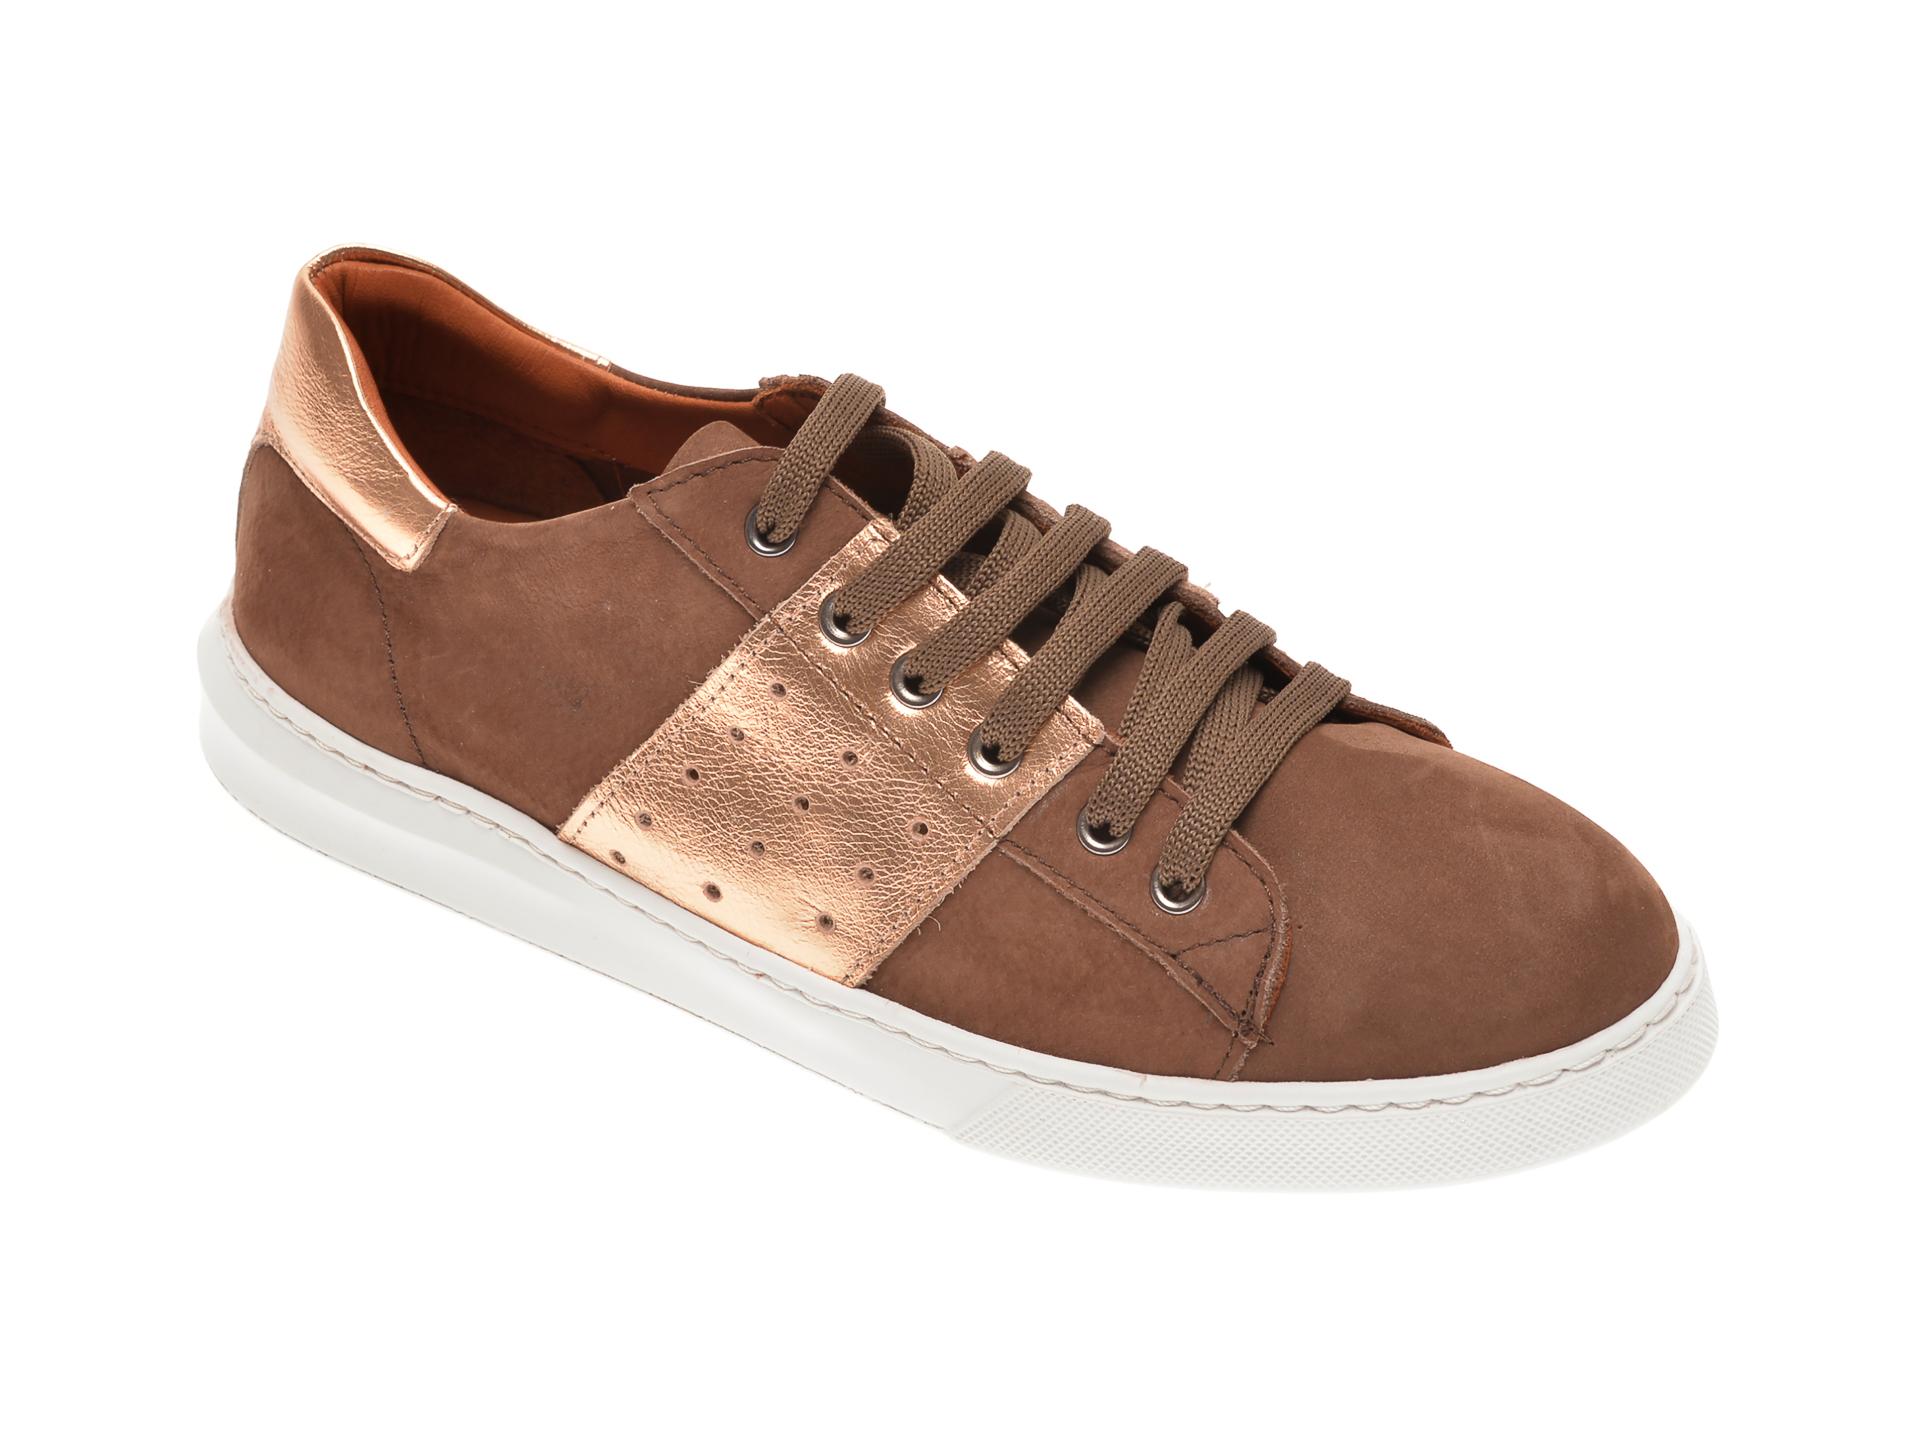 Pantofi BABOOS maro, 2303, din piele naturala imagine